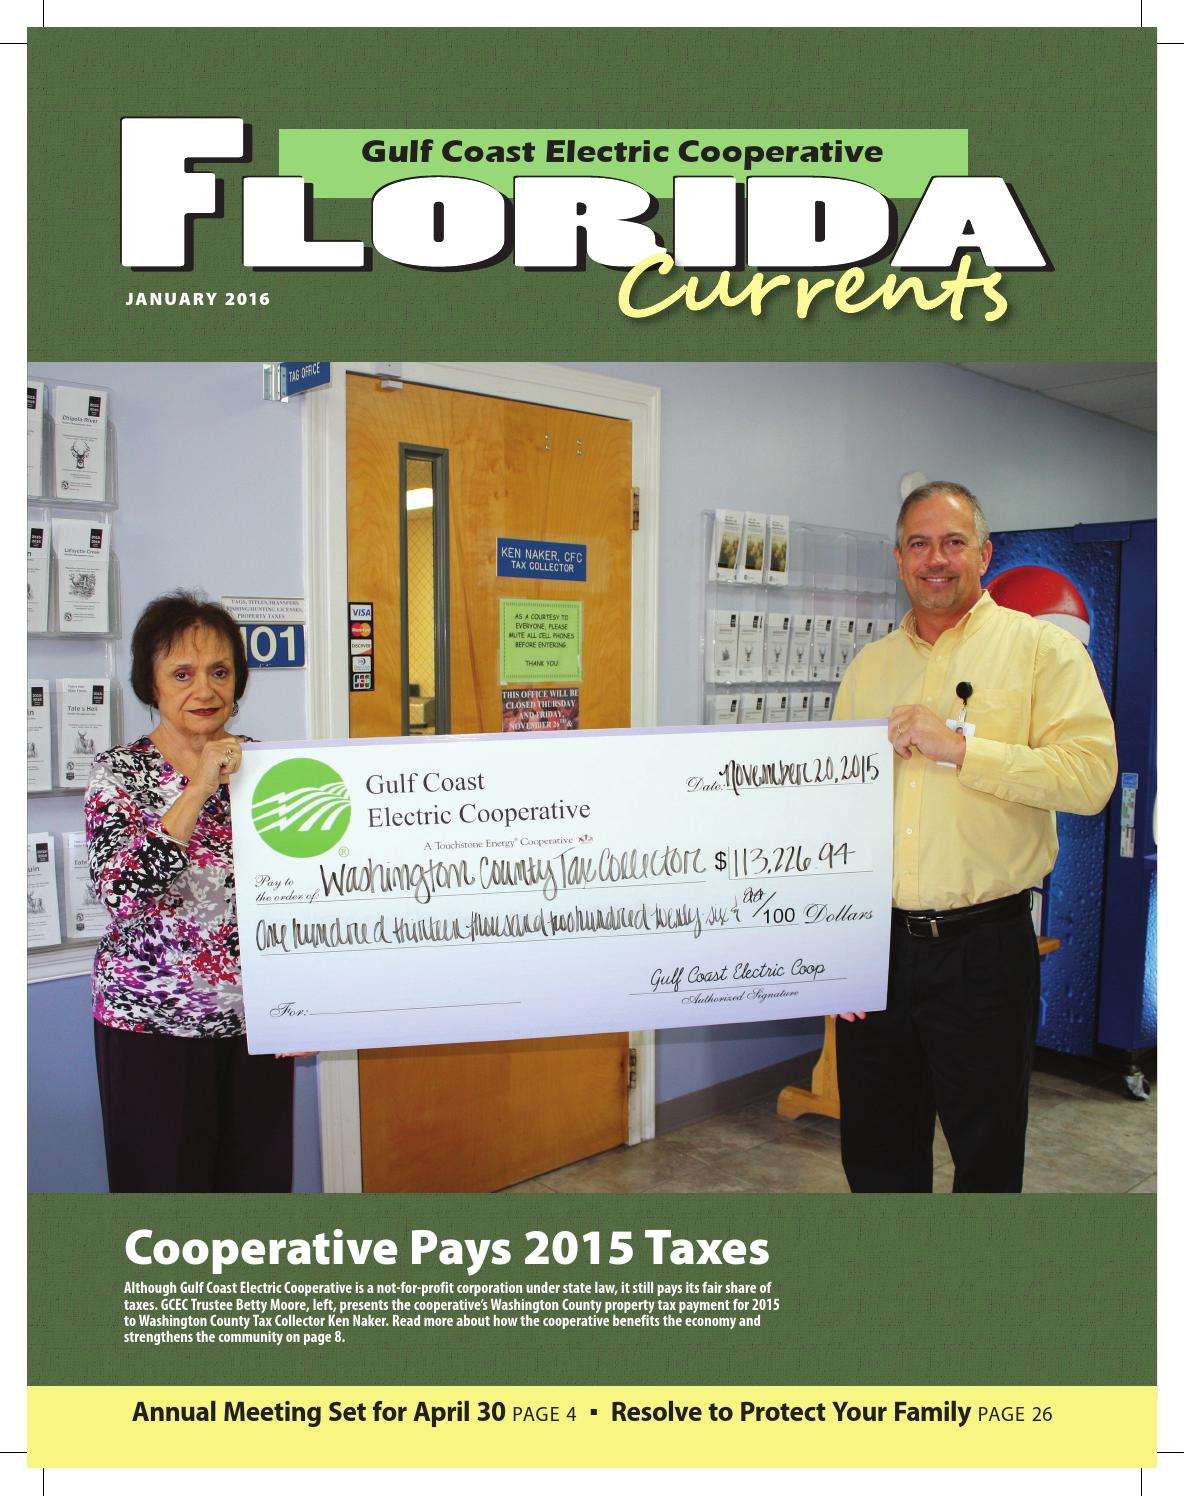 2016 January Gulf Coast Electric Cooperative Florida